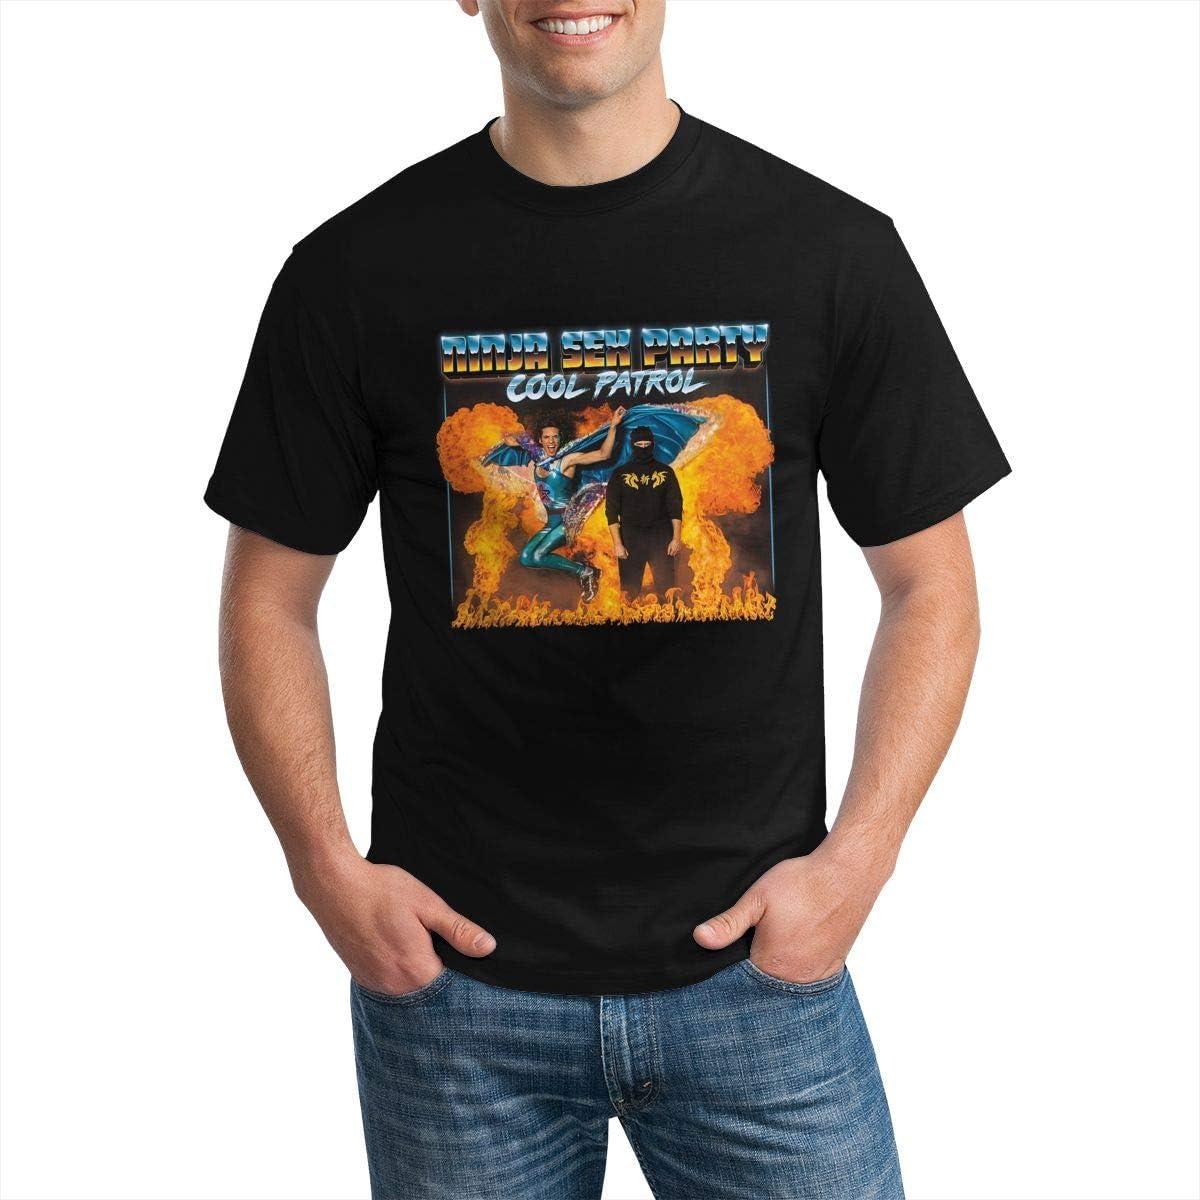 Ninja Sex Party T Shirt Men's Stylish Short Sleeves Round Neck T Shirts